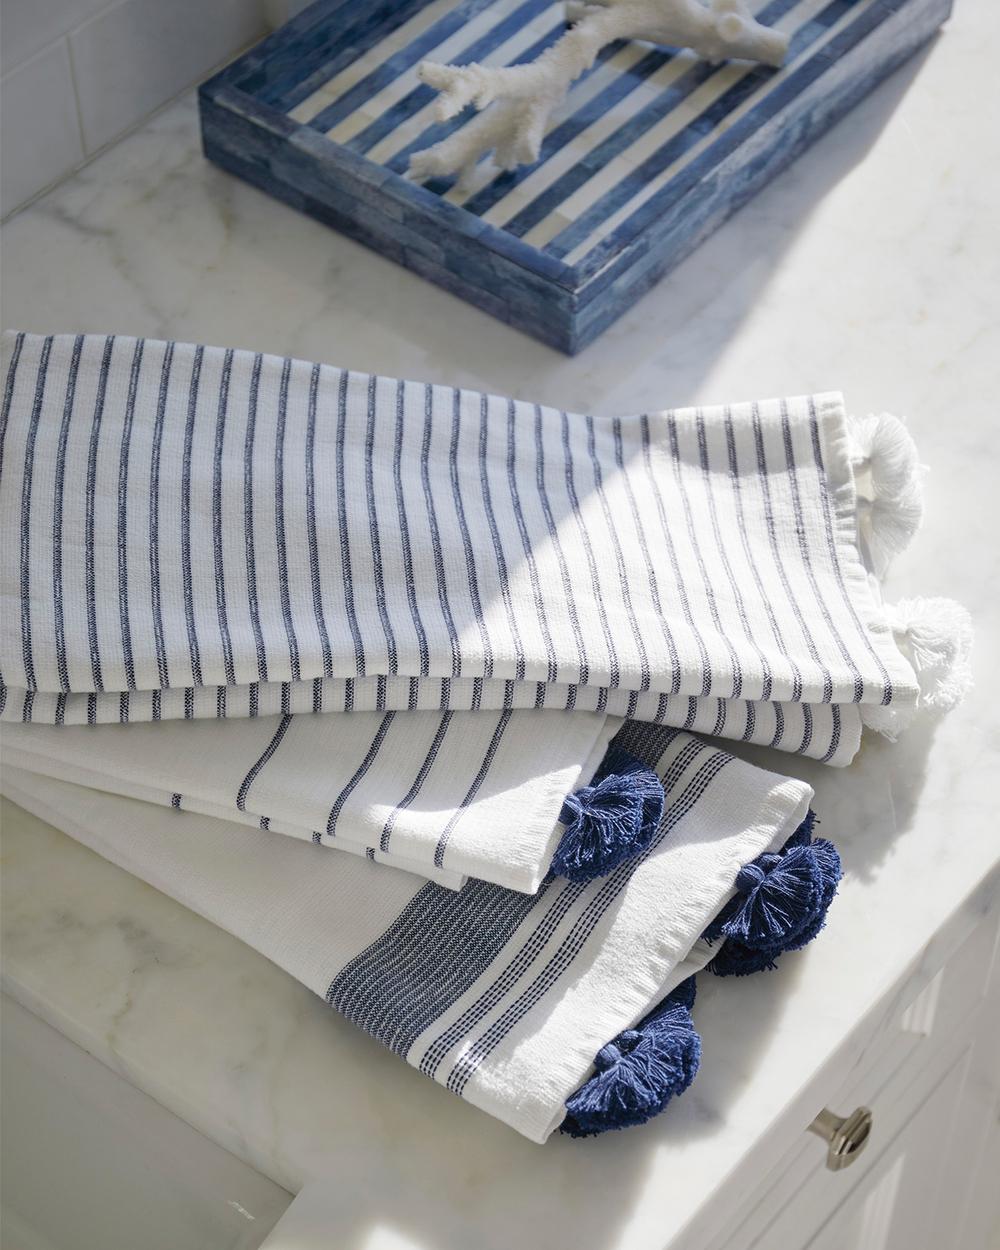 CAT_Towels-0119_Crop_BASE.jpg